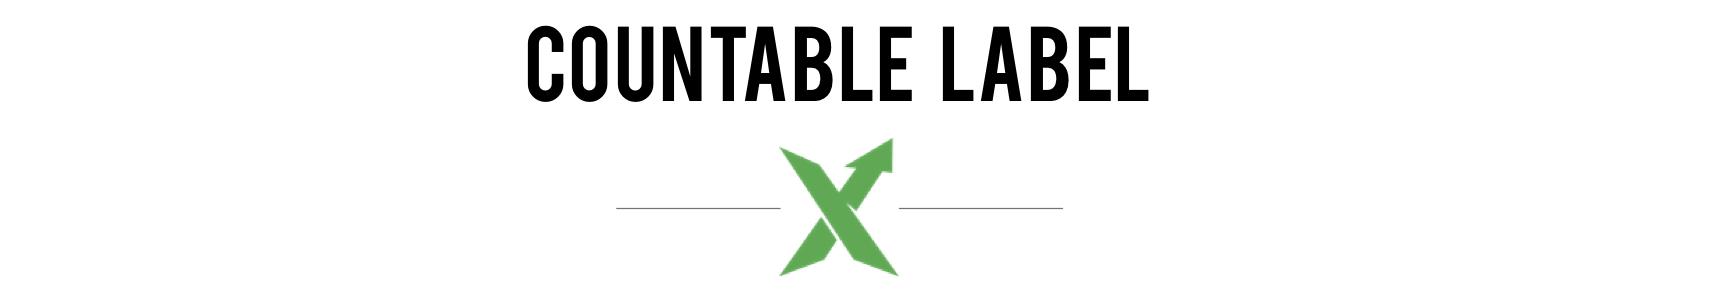 Countable Label Logo